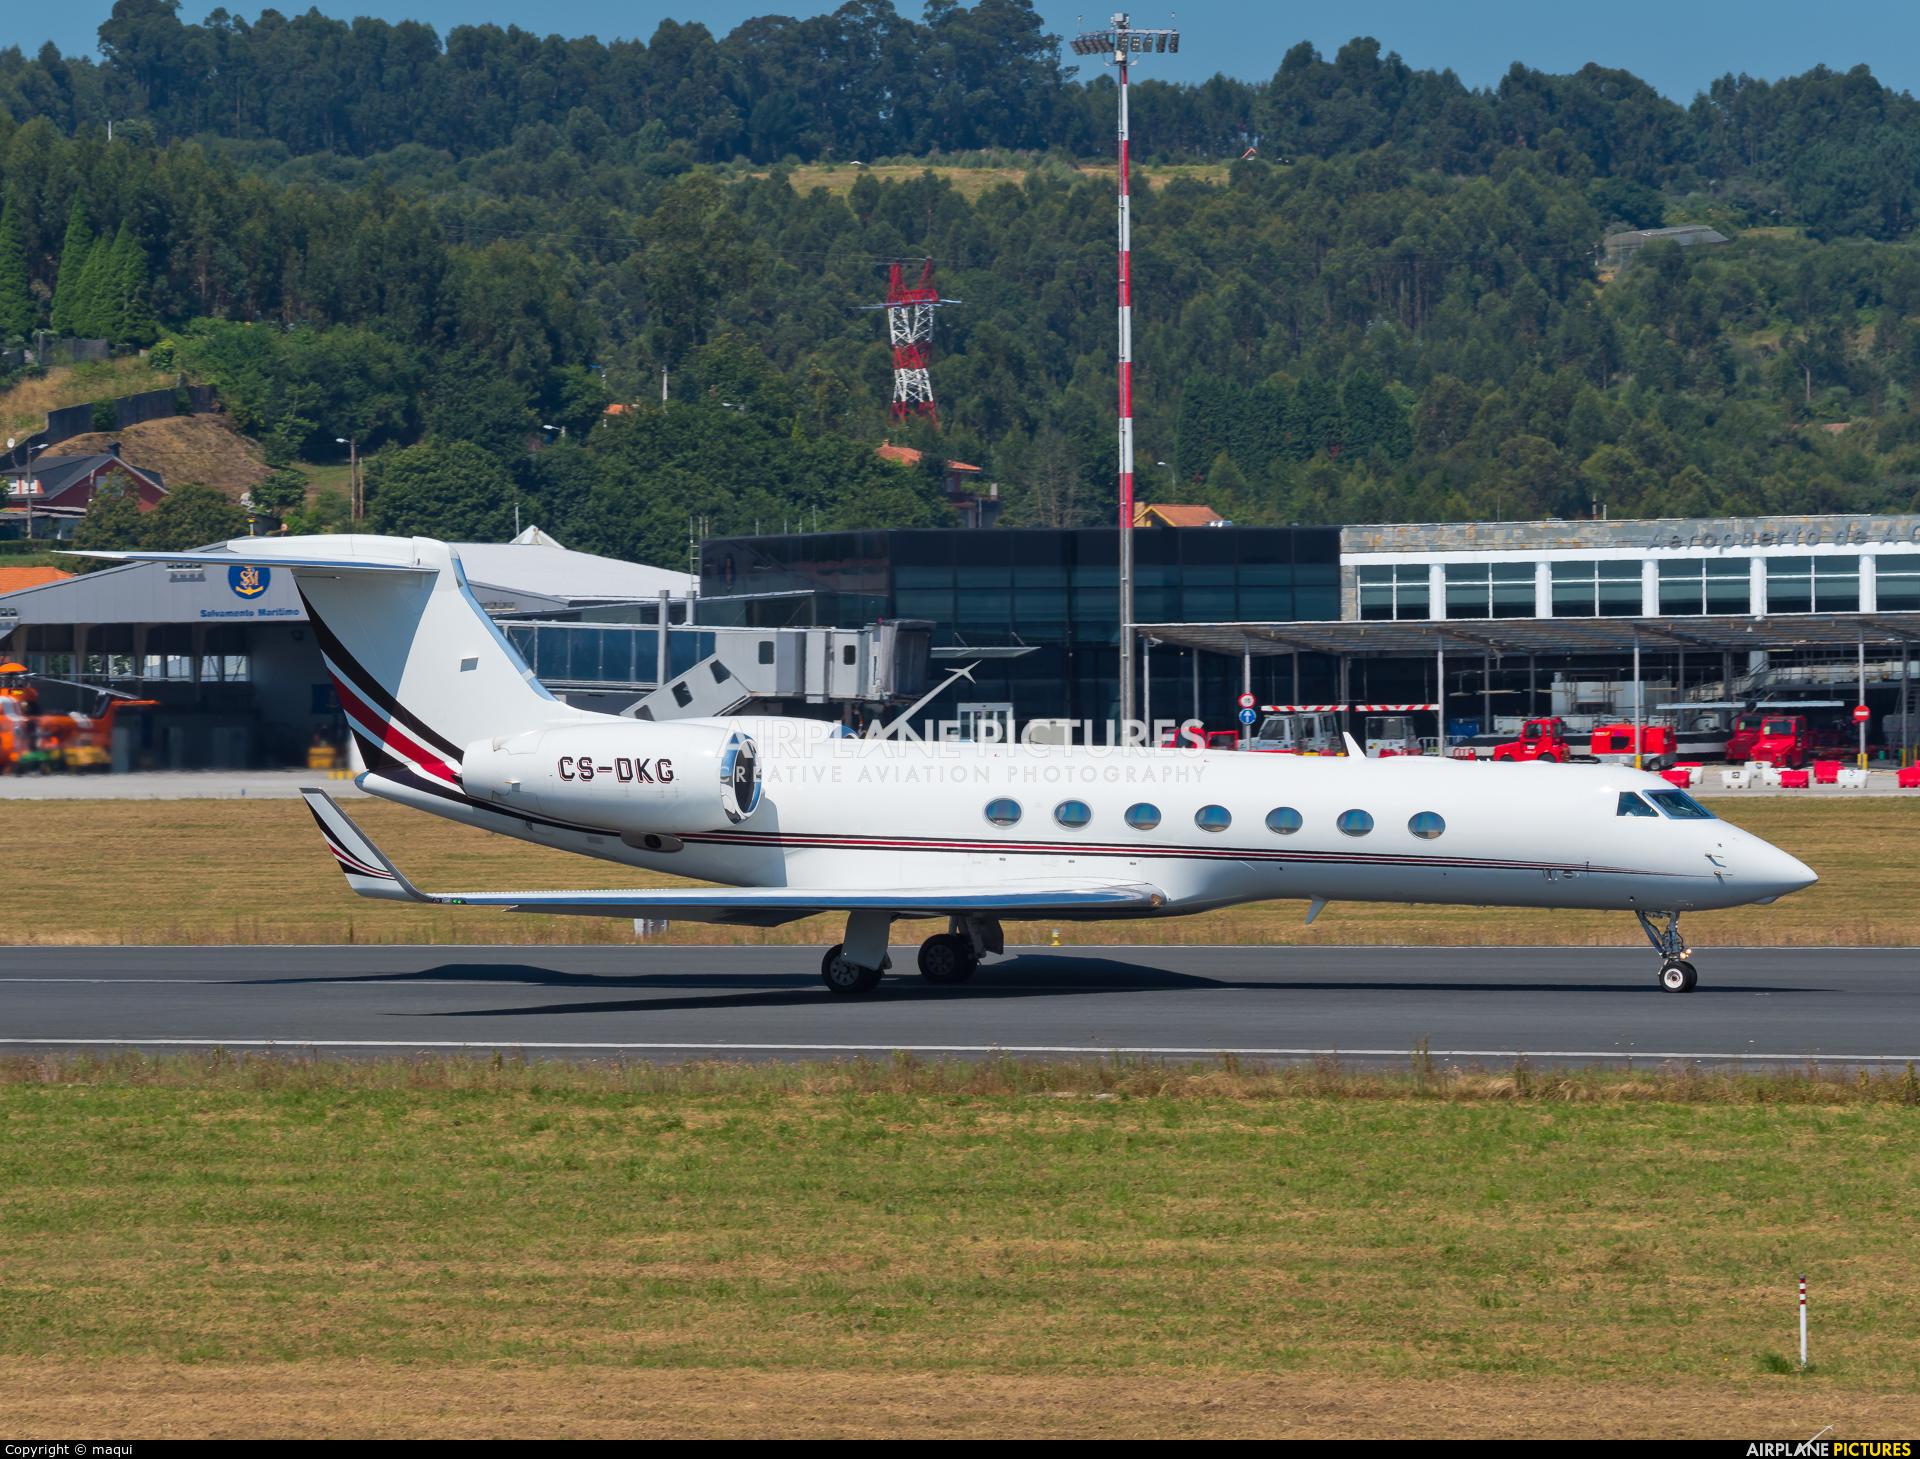 NetJets Europe (Portugal) CS-DKG aircraft at La Coruña